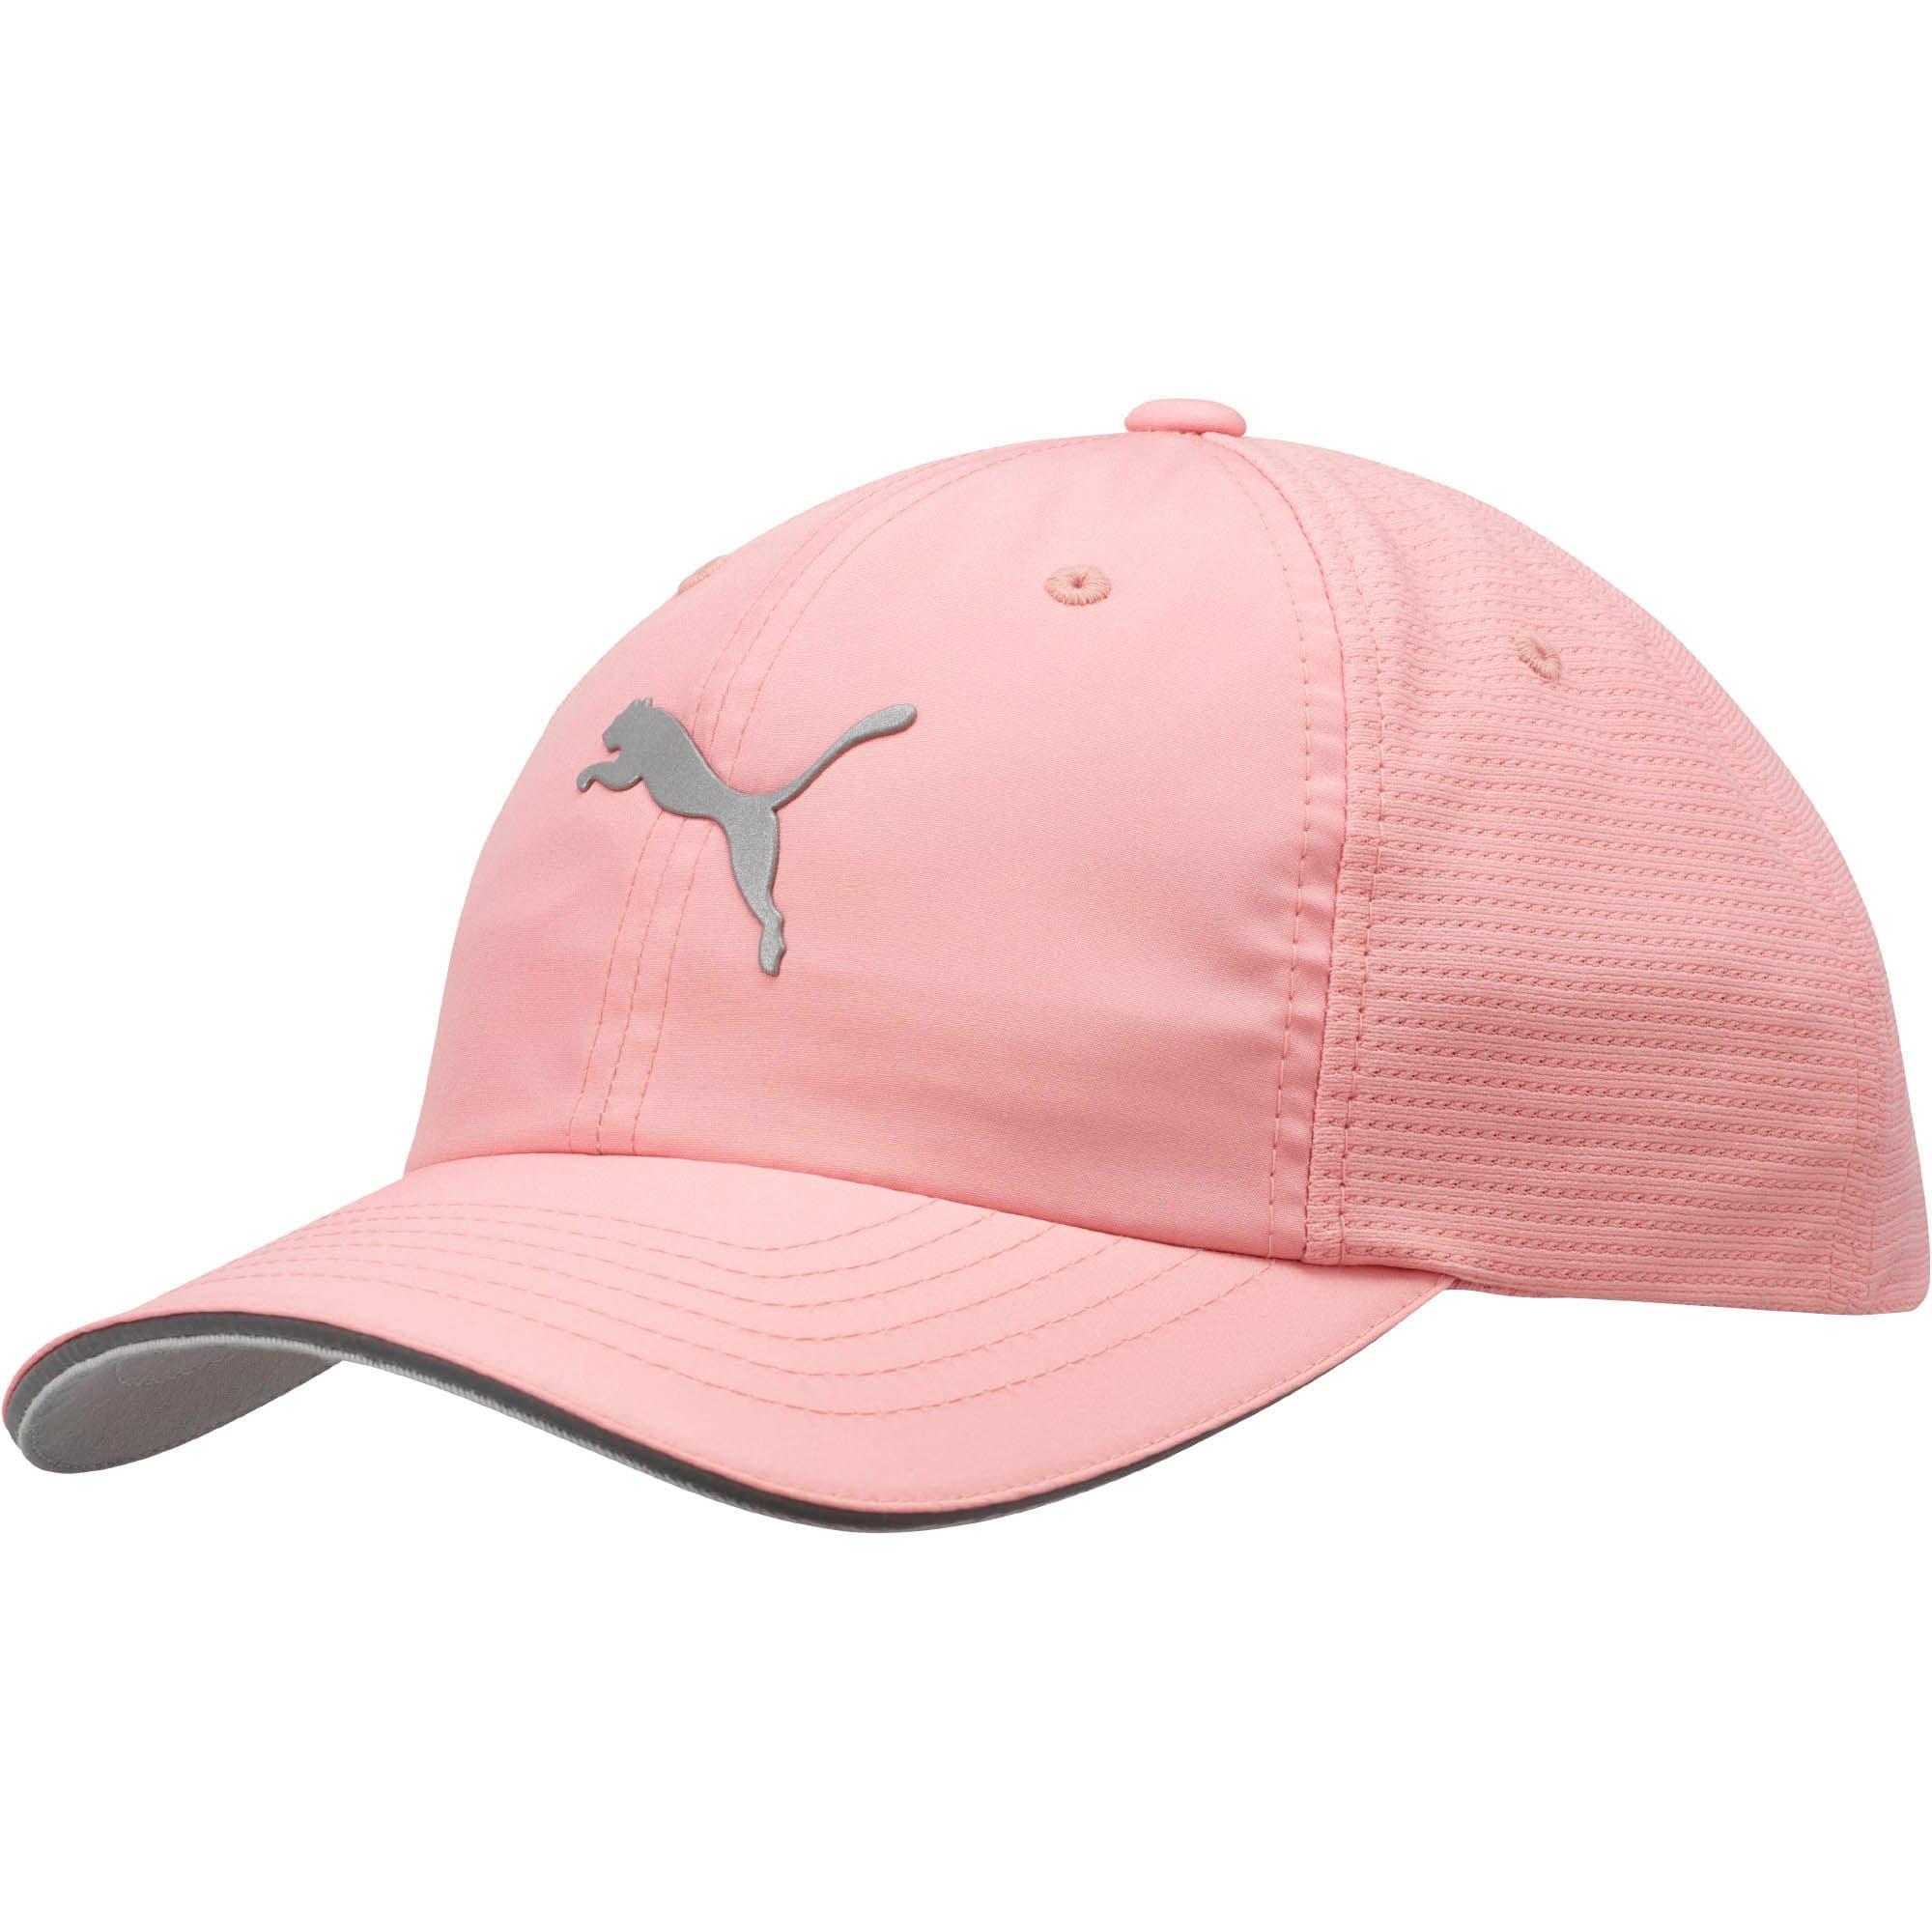 Thumbnail 1 of Mesh Running Hat, LT PASTEL PINK, medium